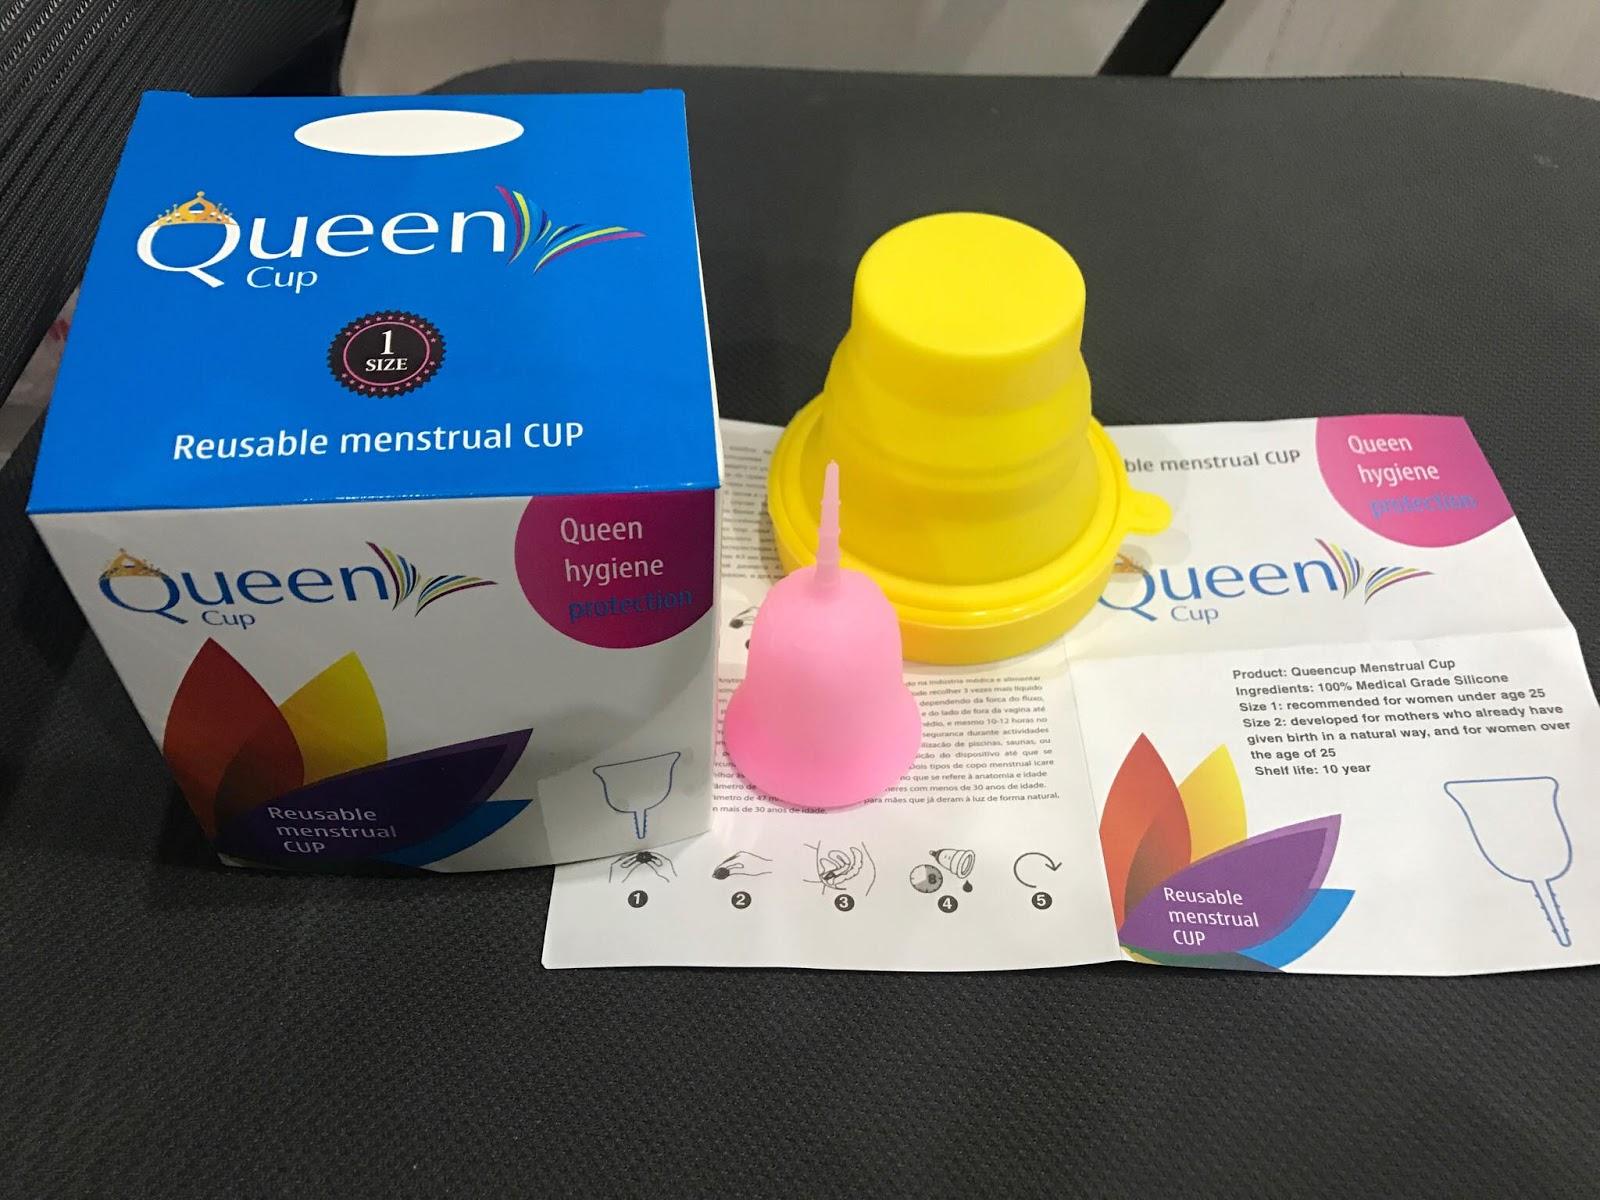 Cốc nguyệt san Queen Cup